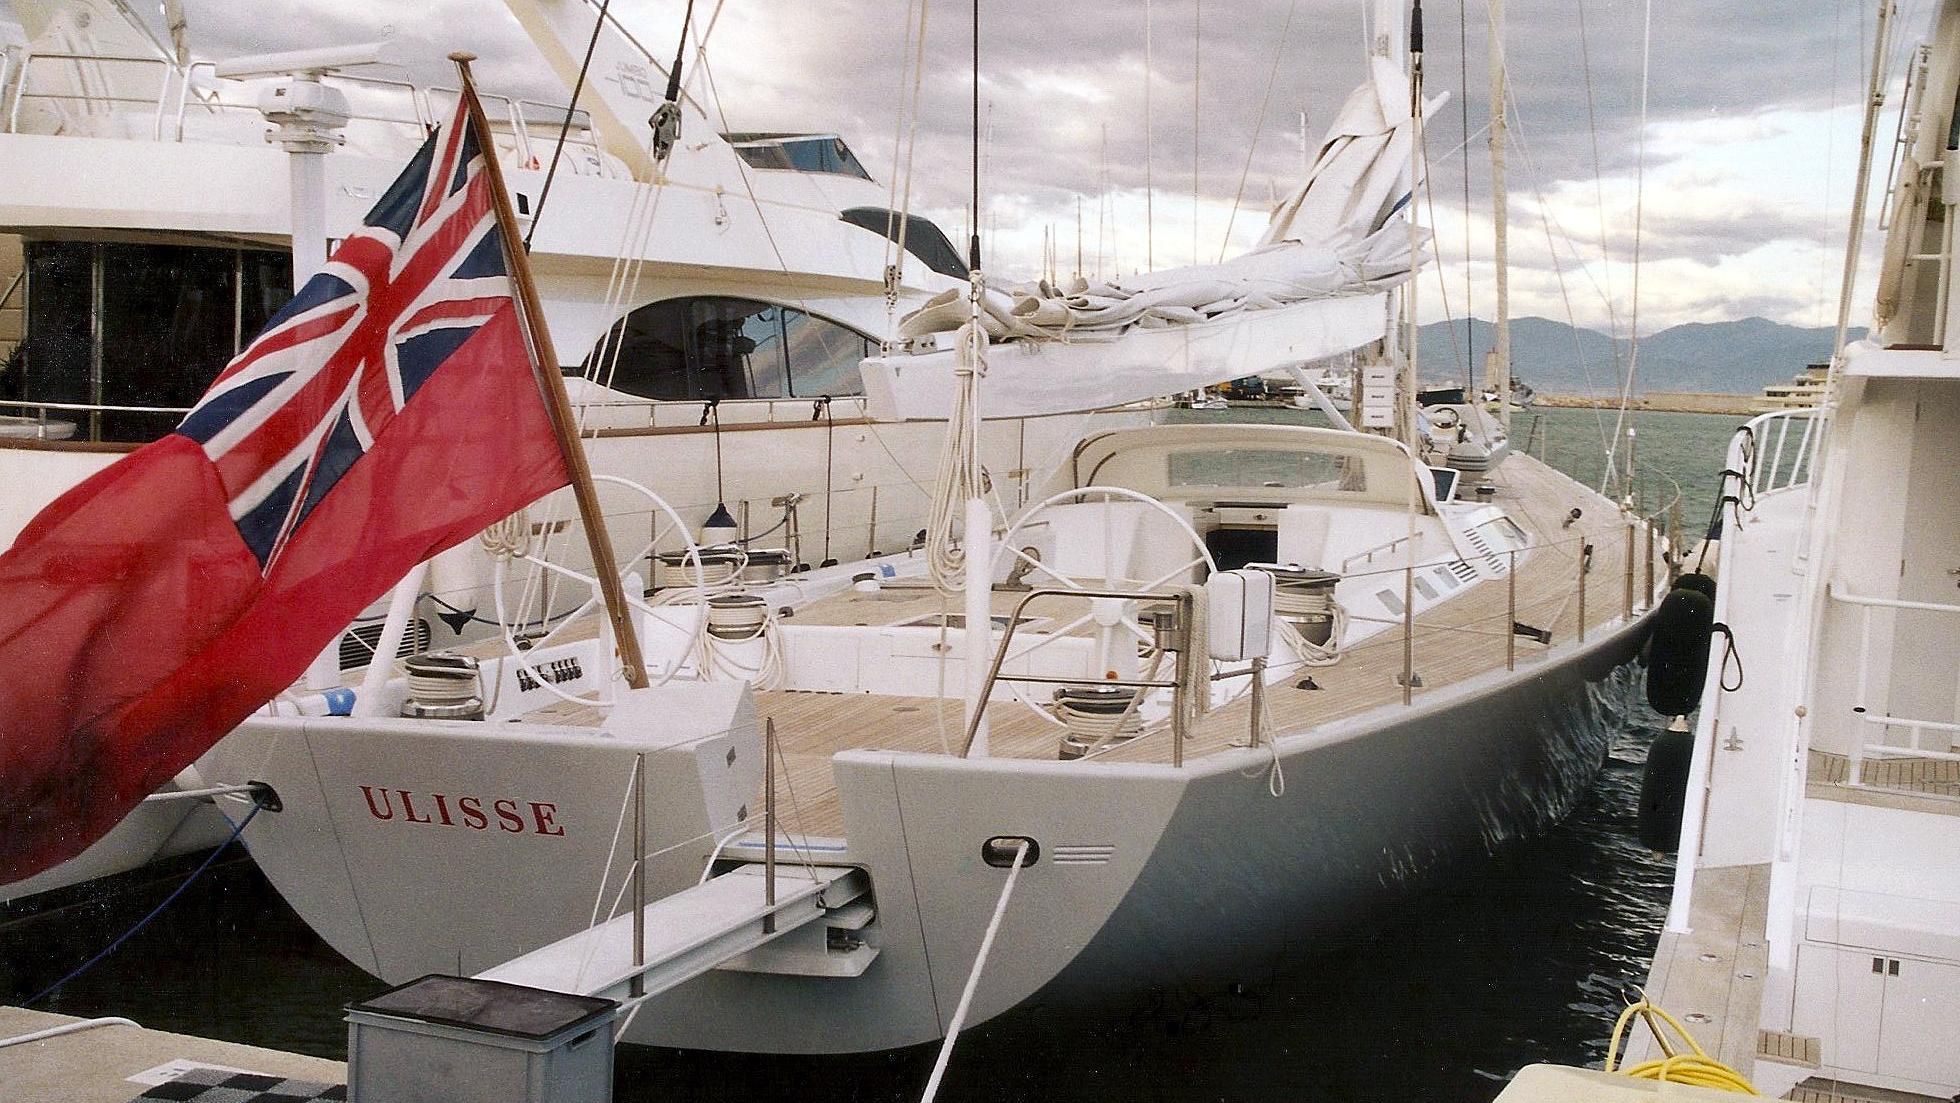 ulisse-sailing-yacht-green-marine-20000-32m-stern